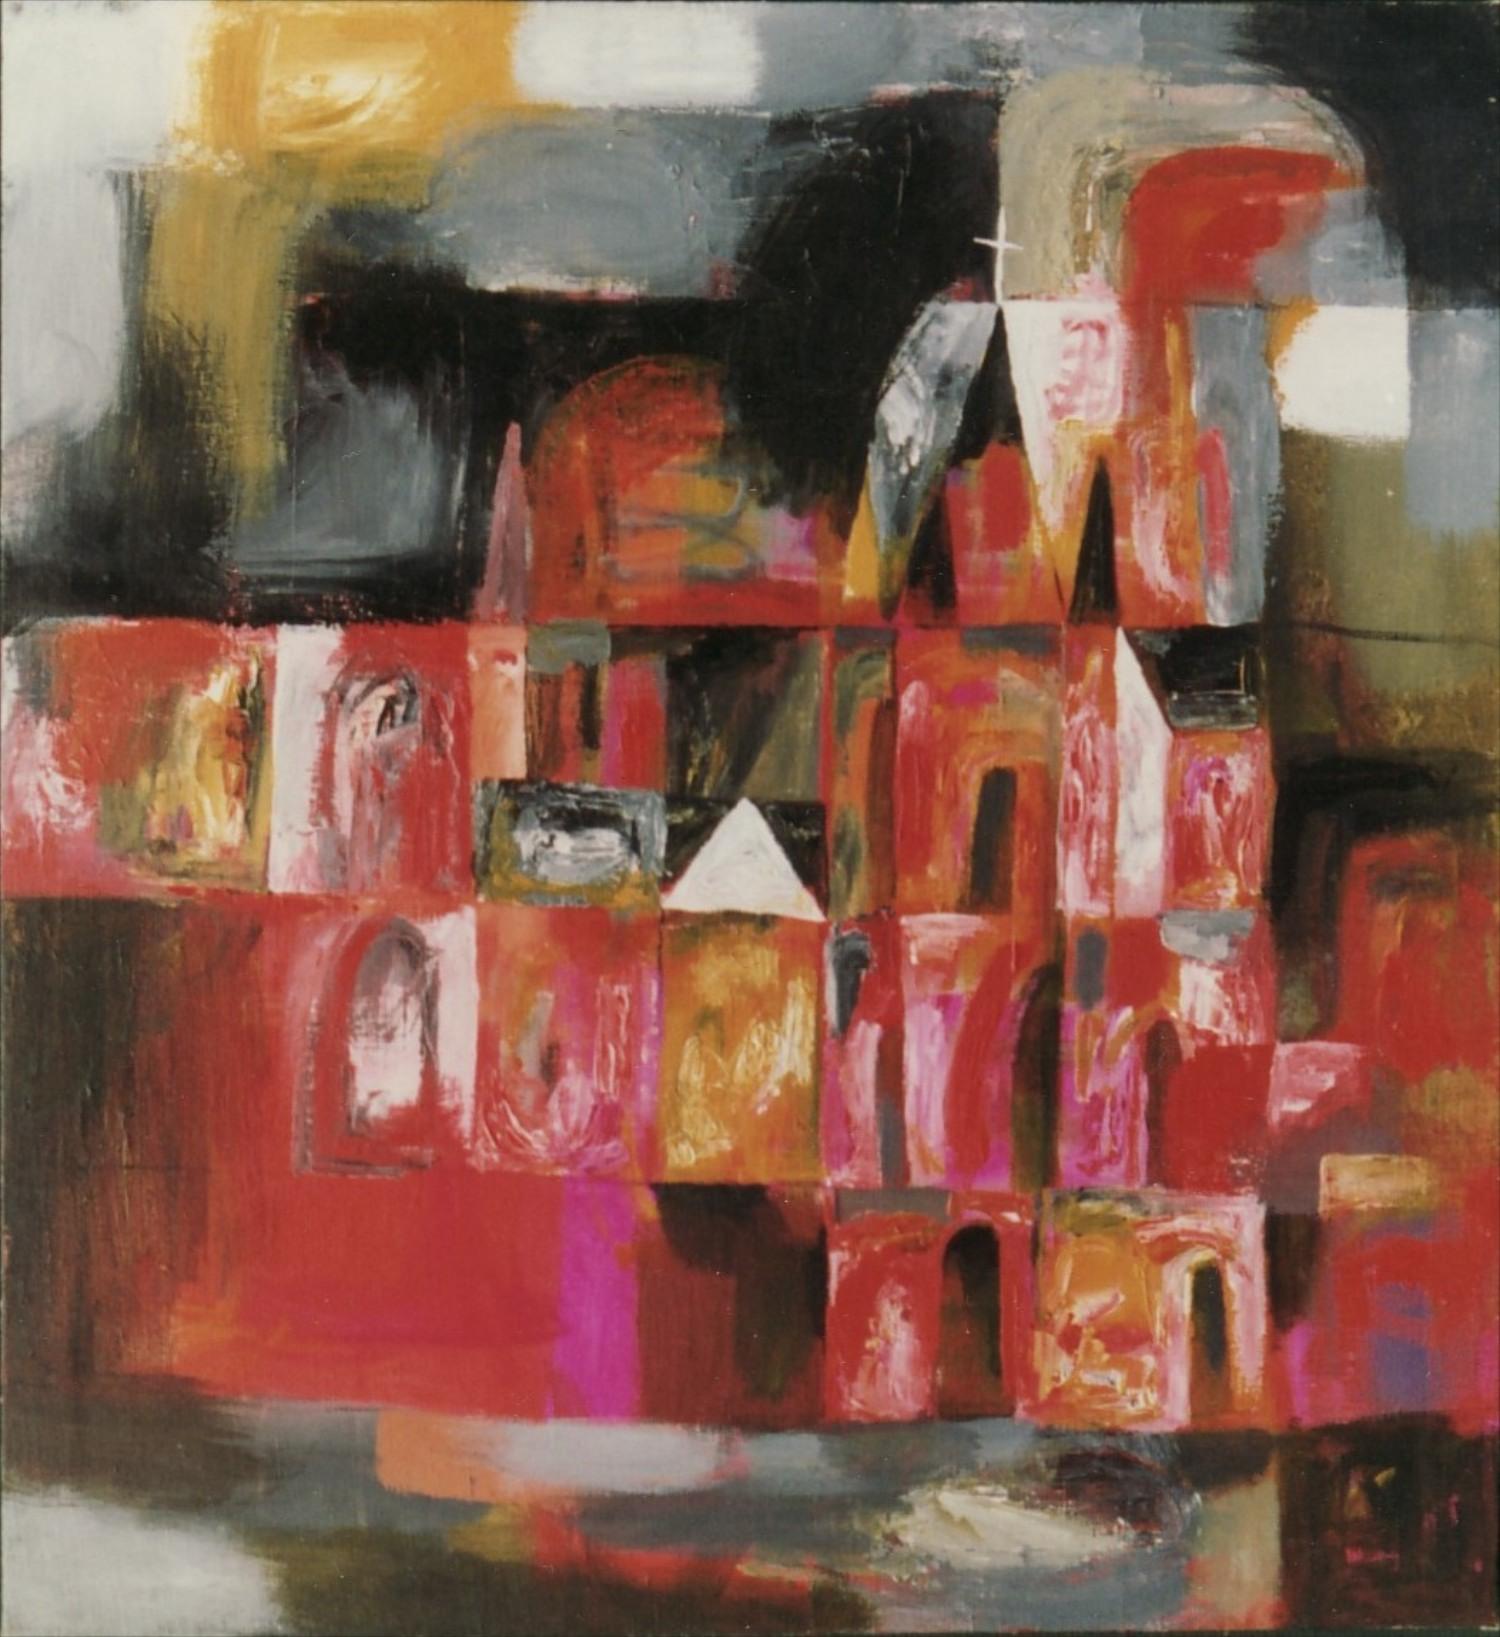 #14638 Wang Lan. BUILDINGS. No.6. 1993. 66x61cm. Canvas $3180